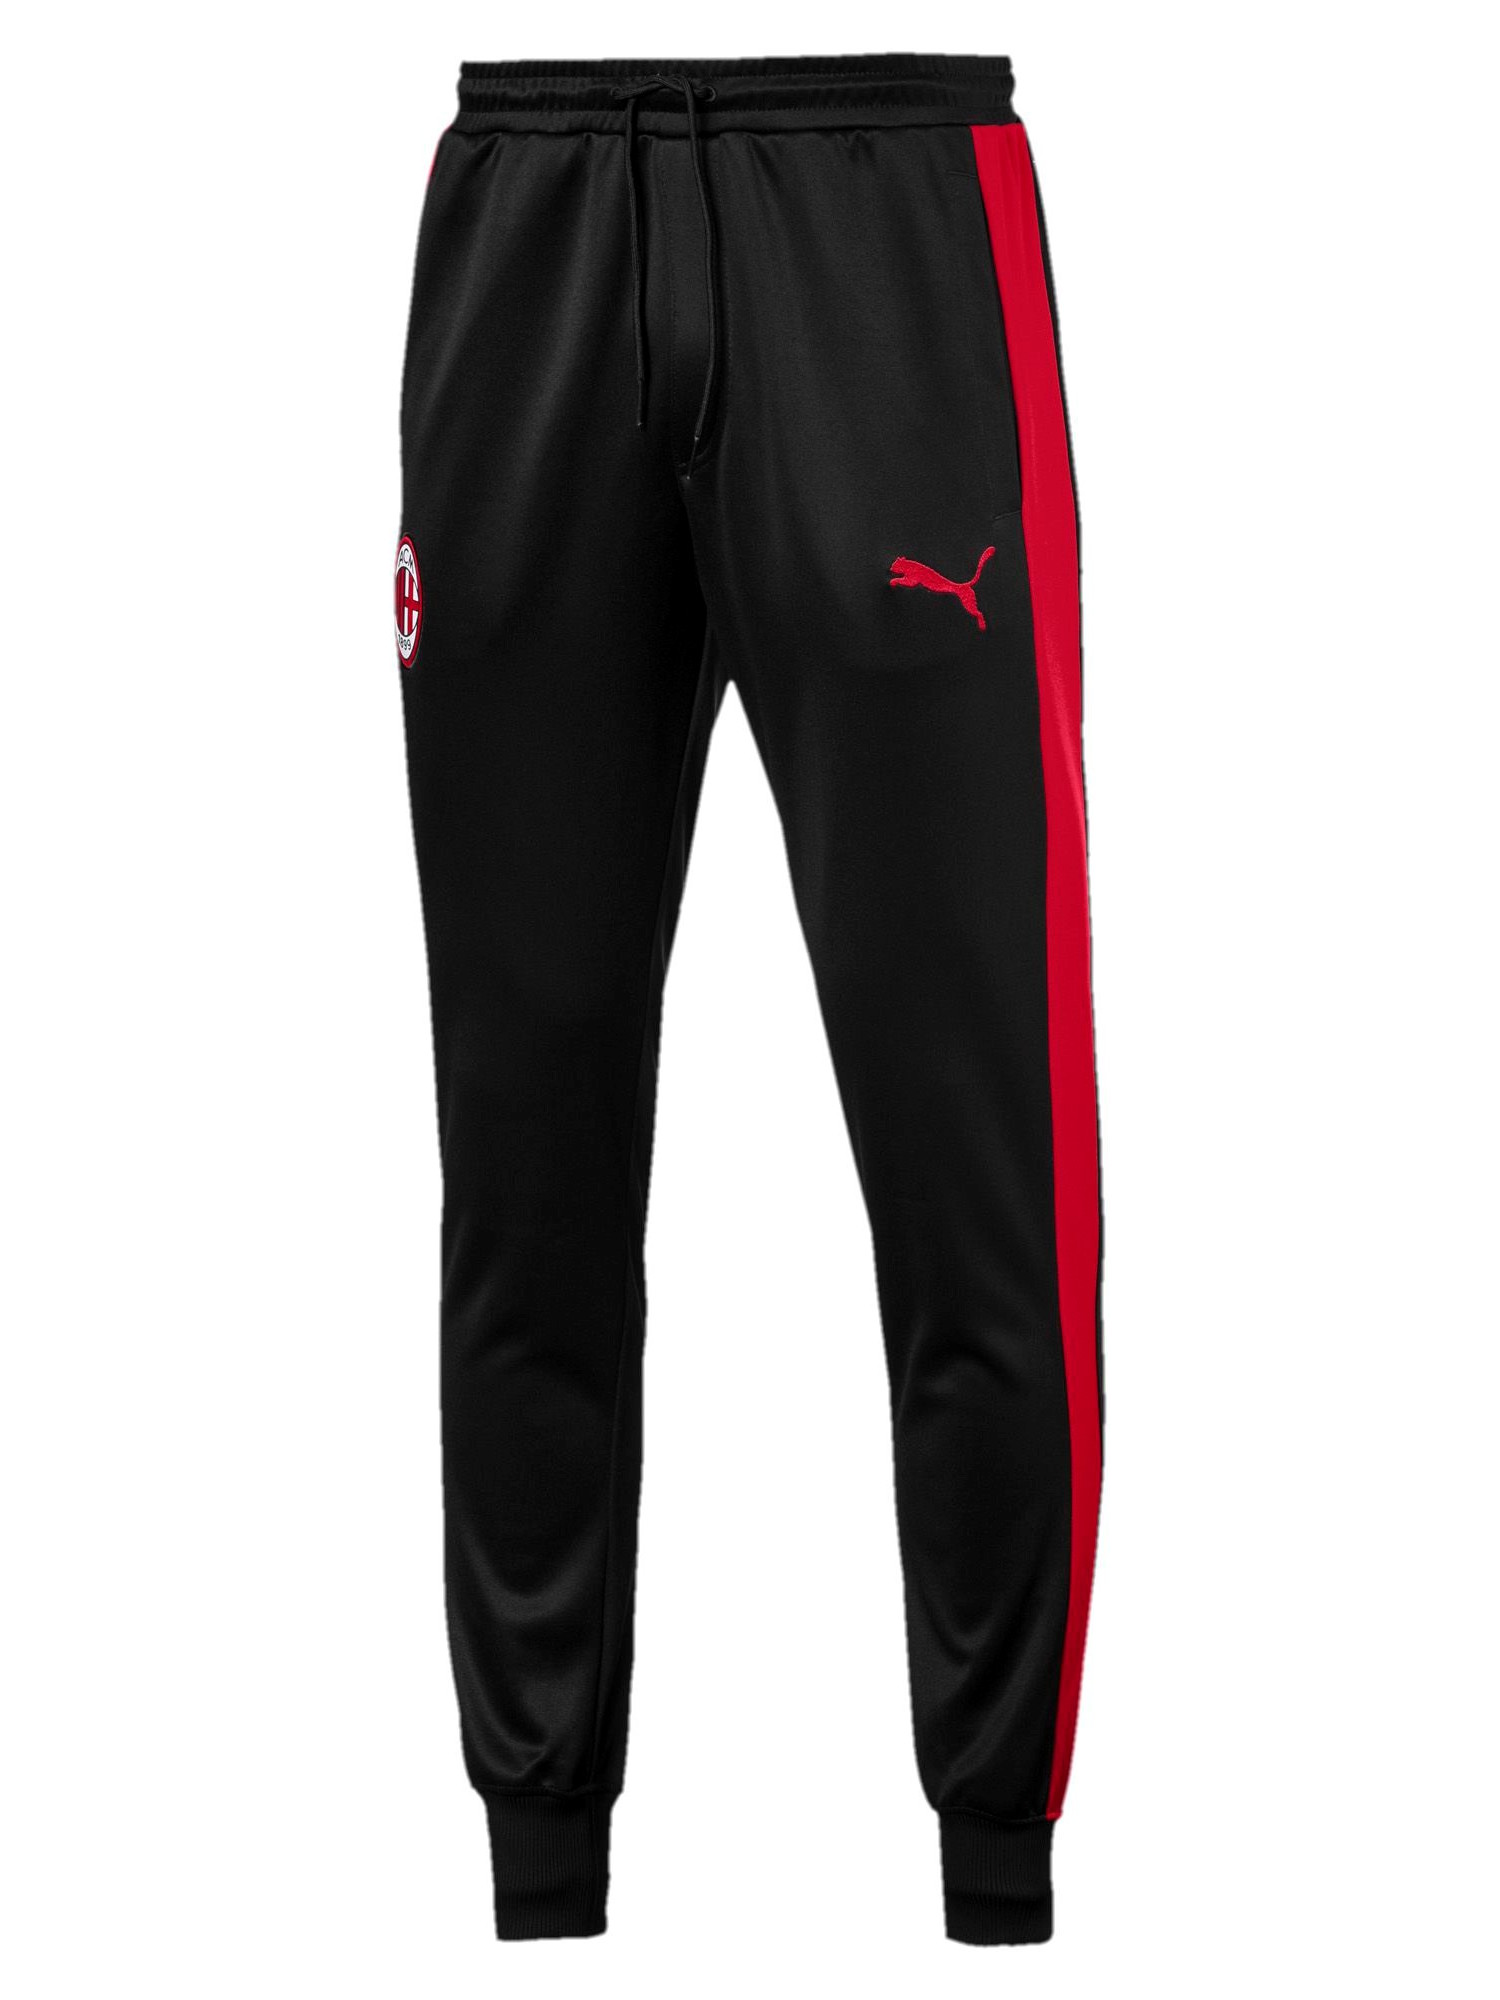 eb83a05b1a9cc9 AC MILAN PUMA Pantaloni tuta Pants 2018 19 Nero T7 Track - EUR 55,00 ...